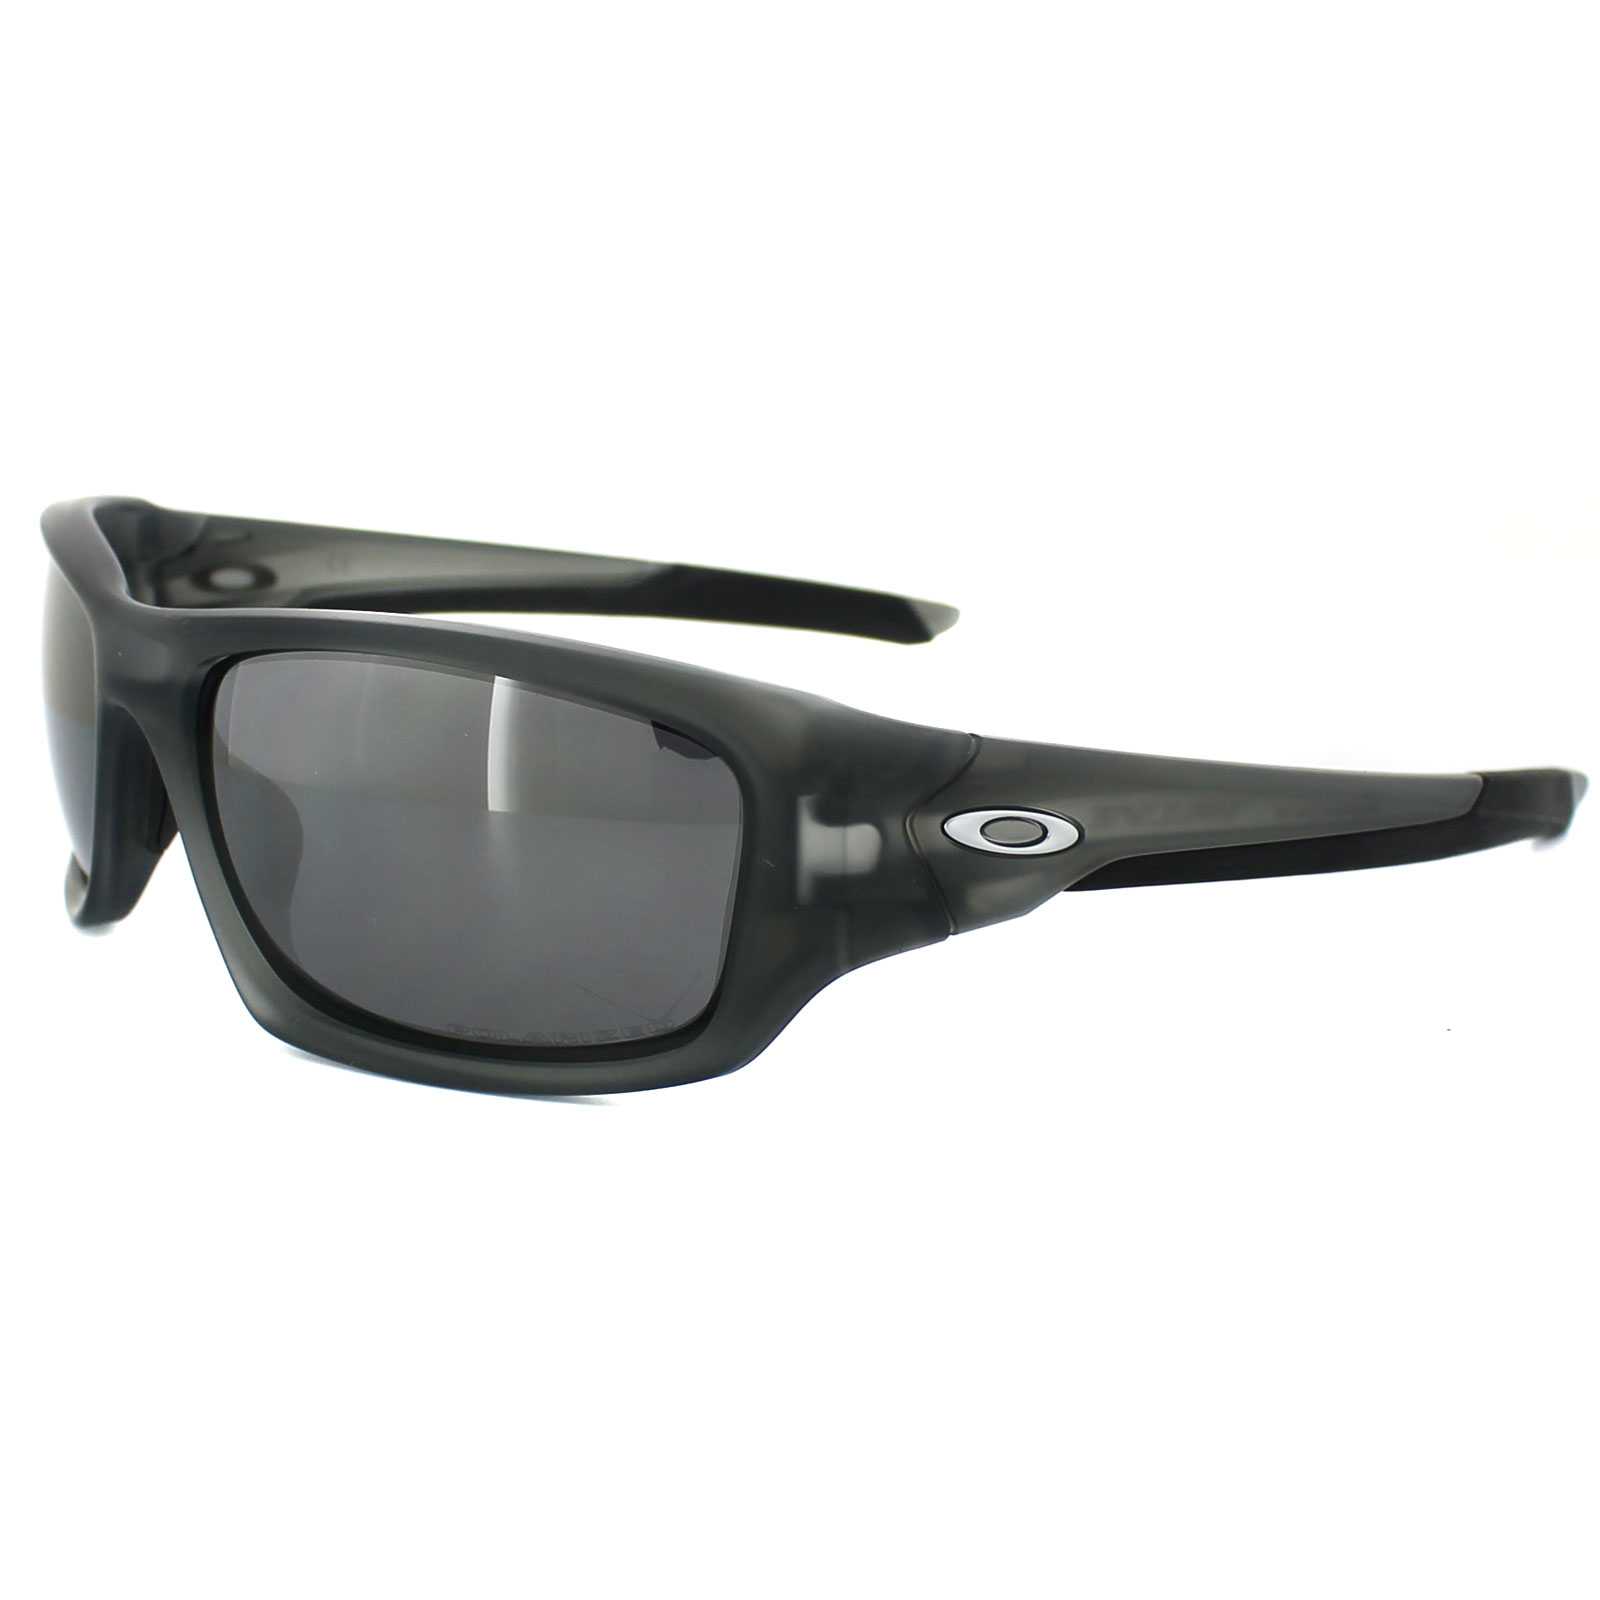 oakley valve polarized iridium  oakley sunglasses valve oo9236 06 grey smoke black iridium polarized